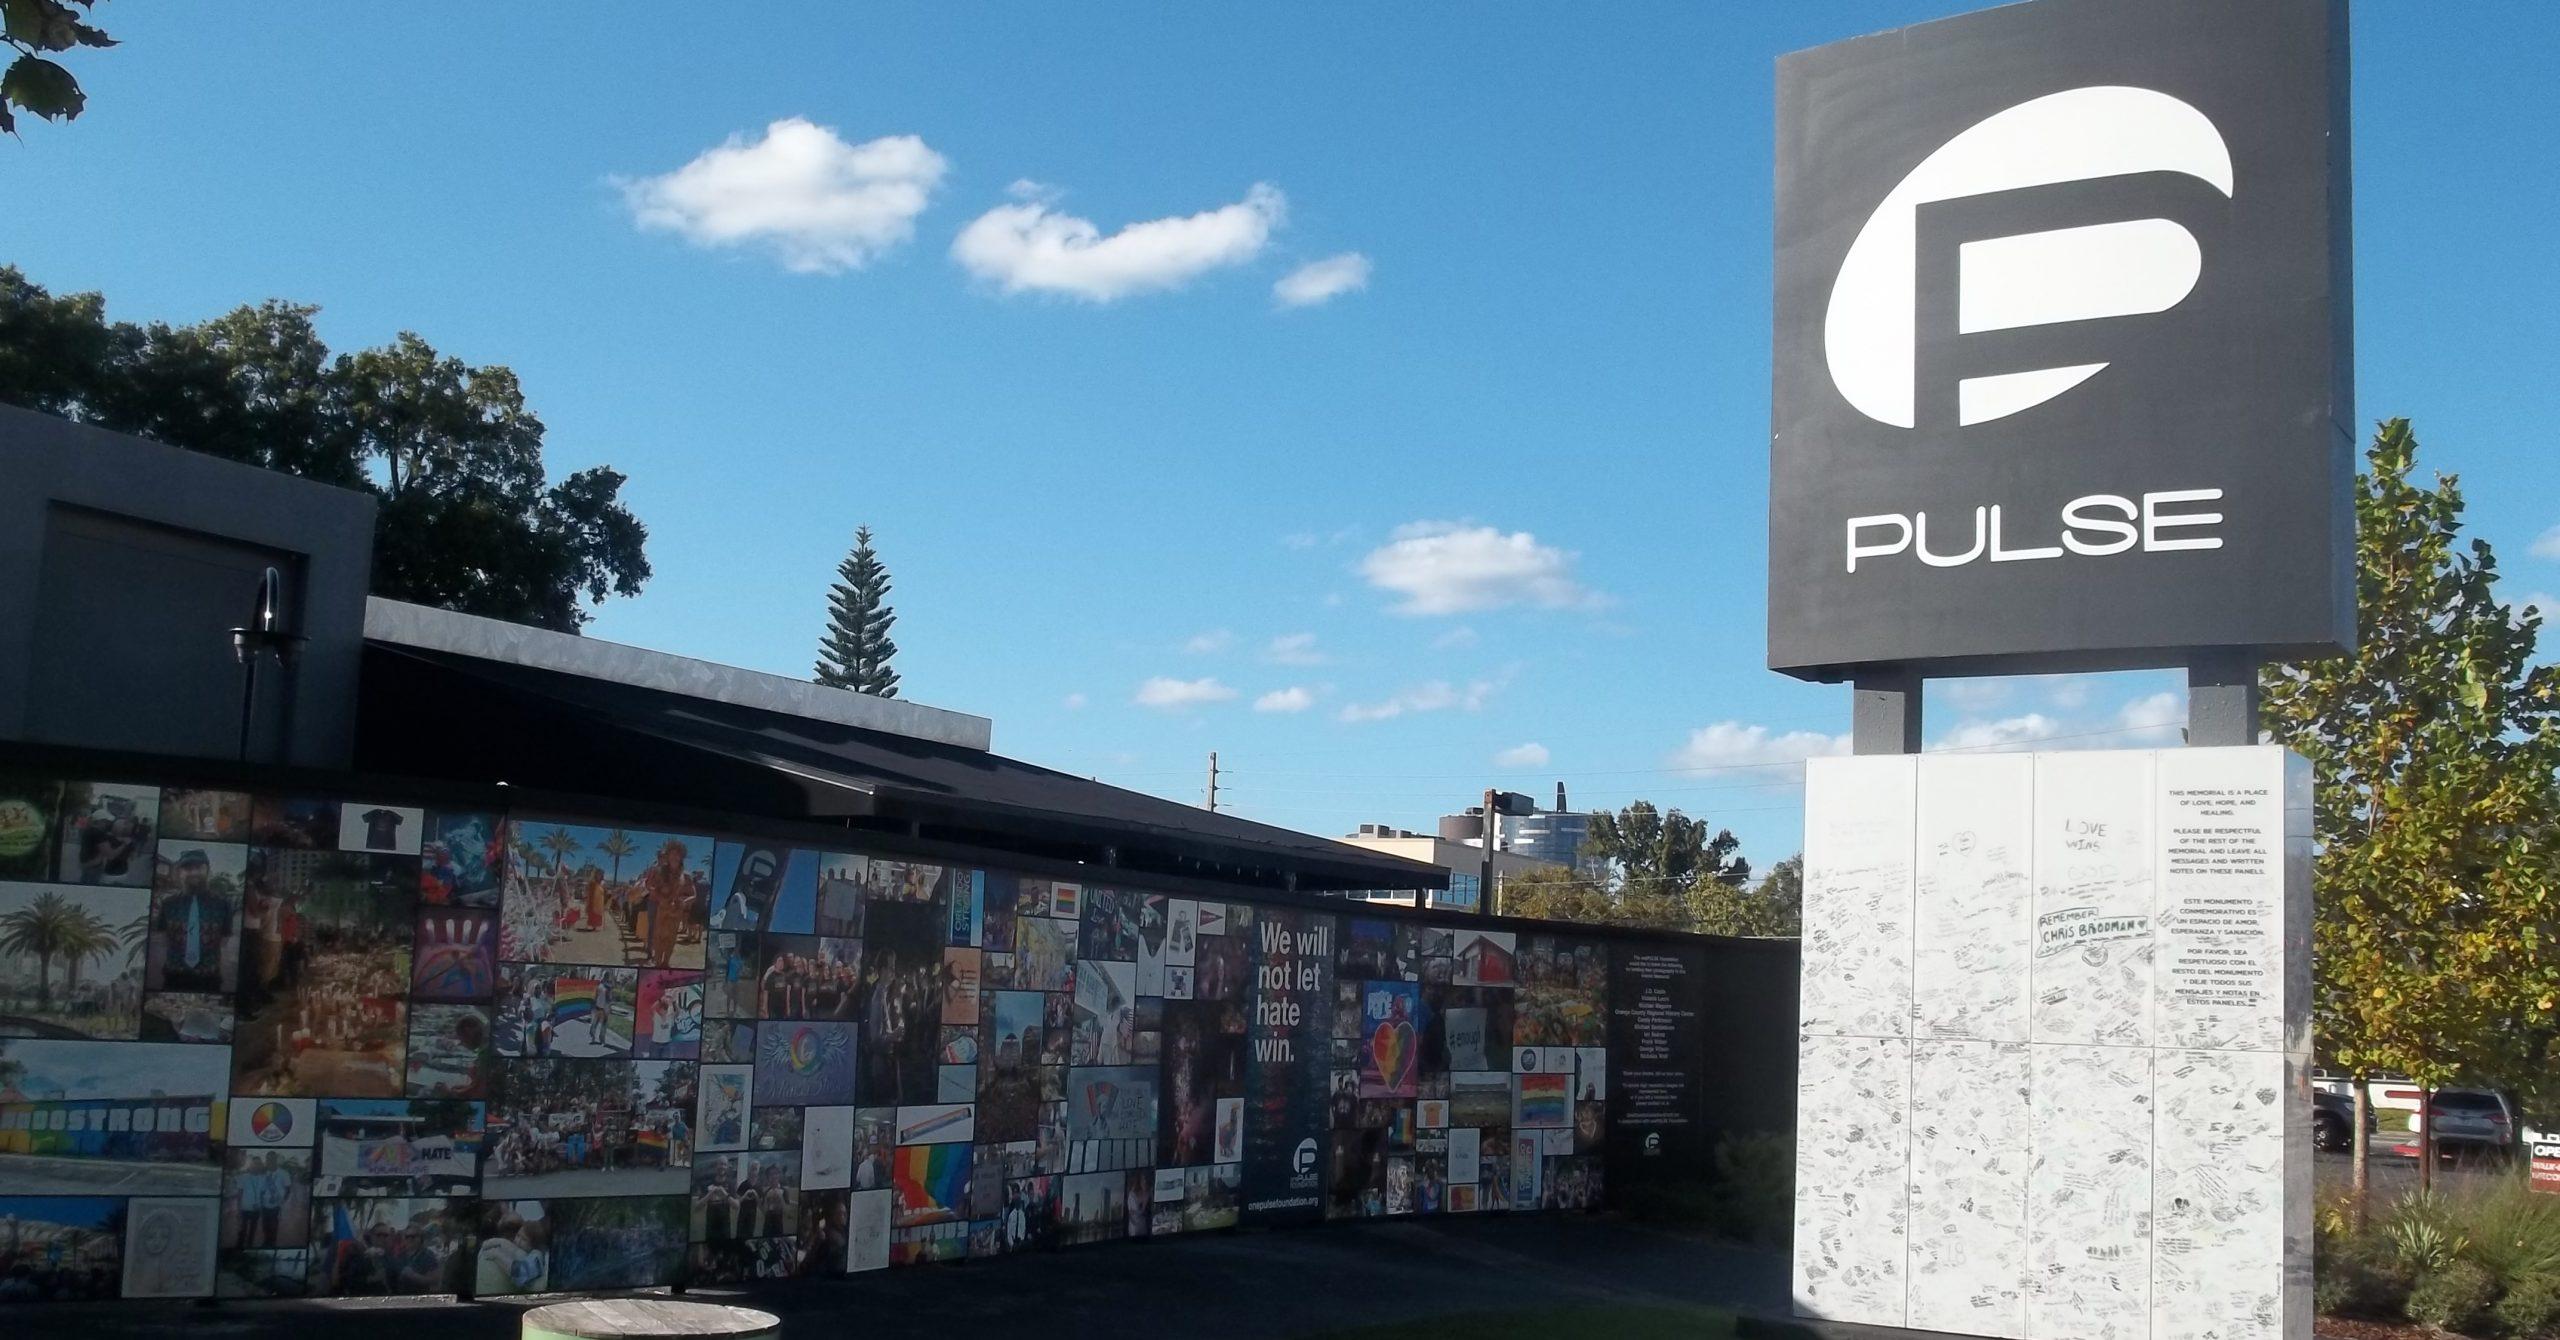 An image of Pulse Nightclub